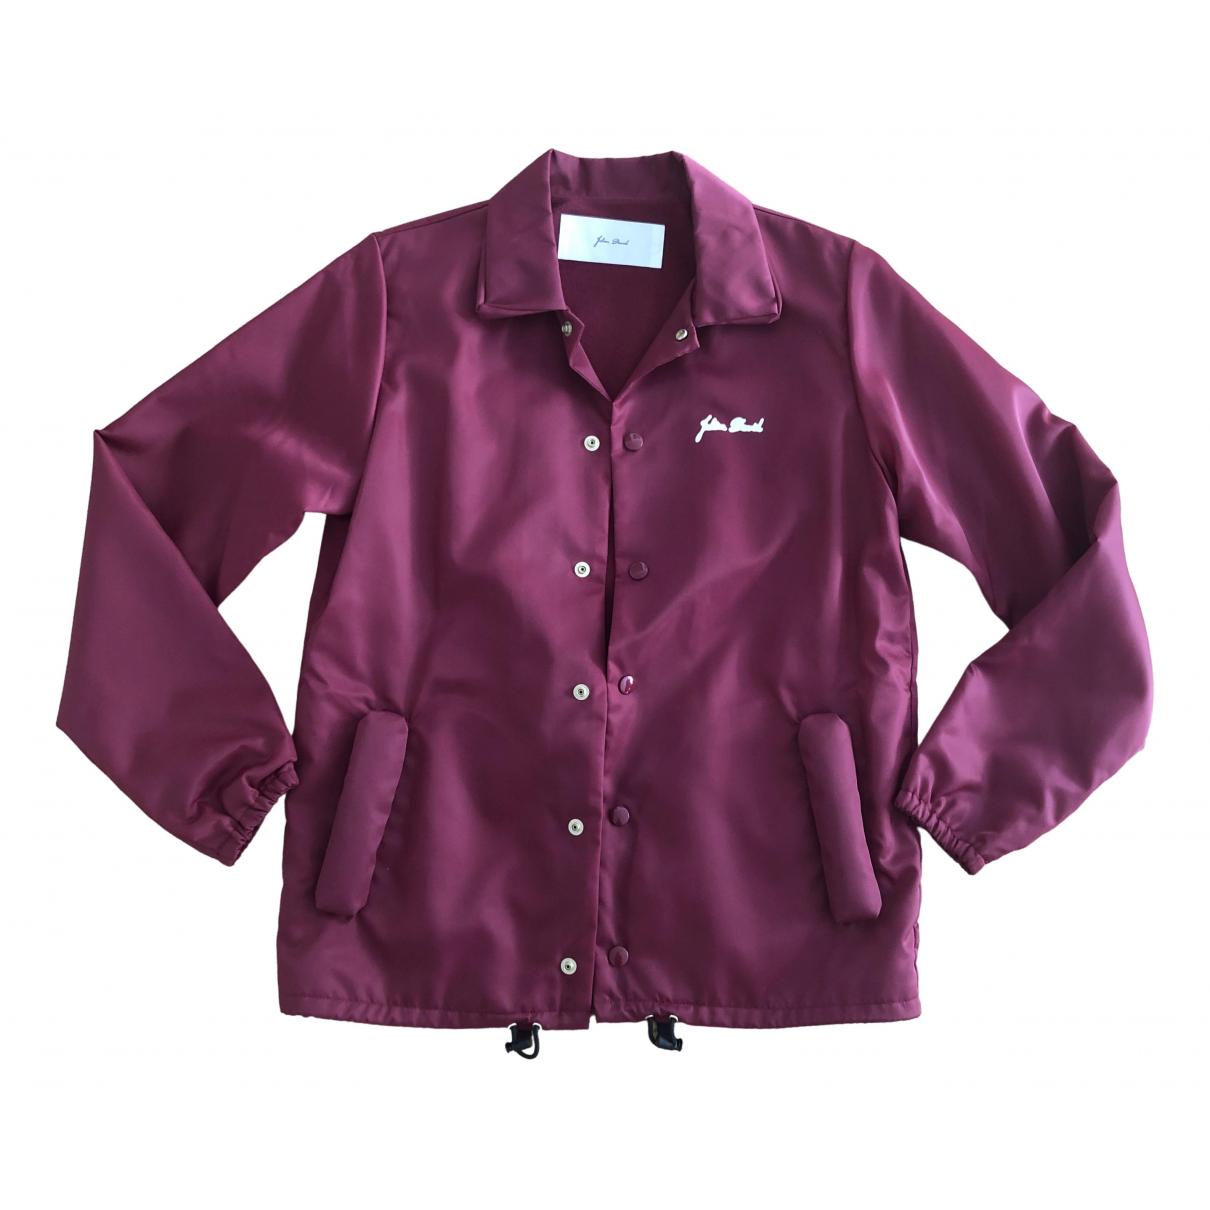 Julien David \N Burgundy jacket for Women S International